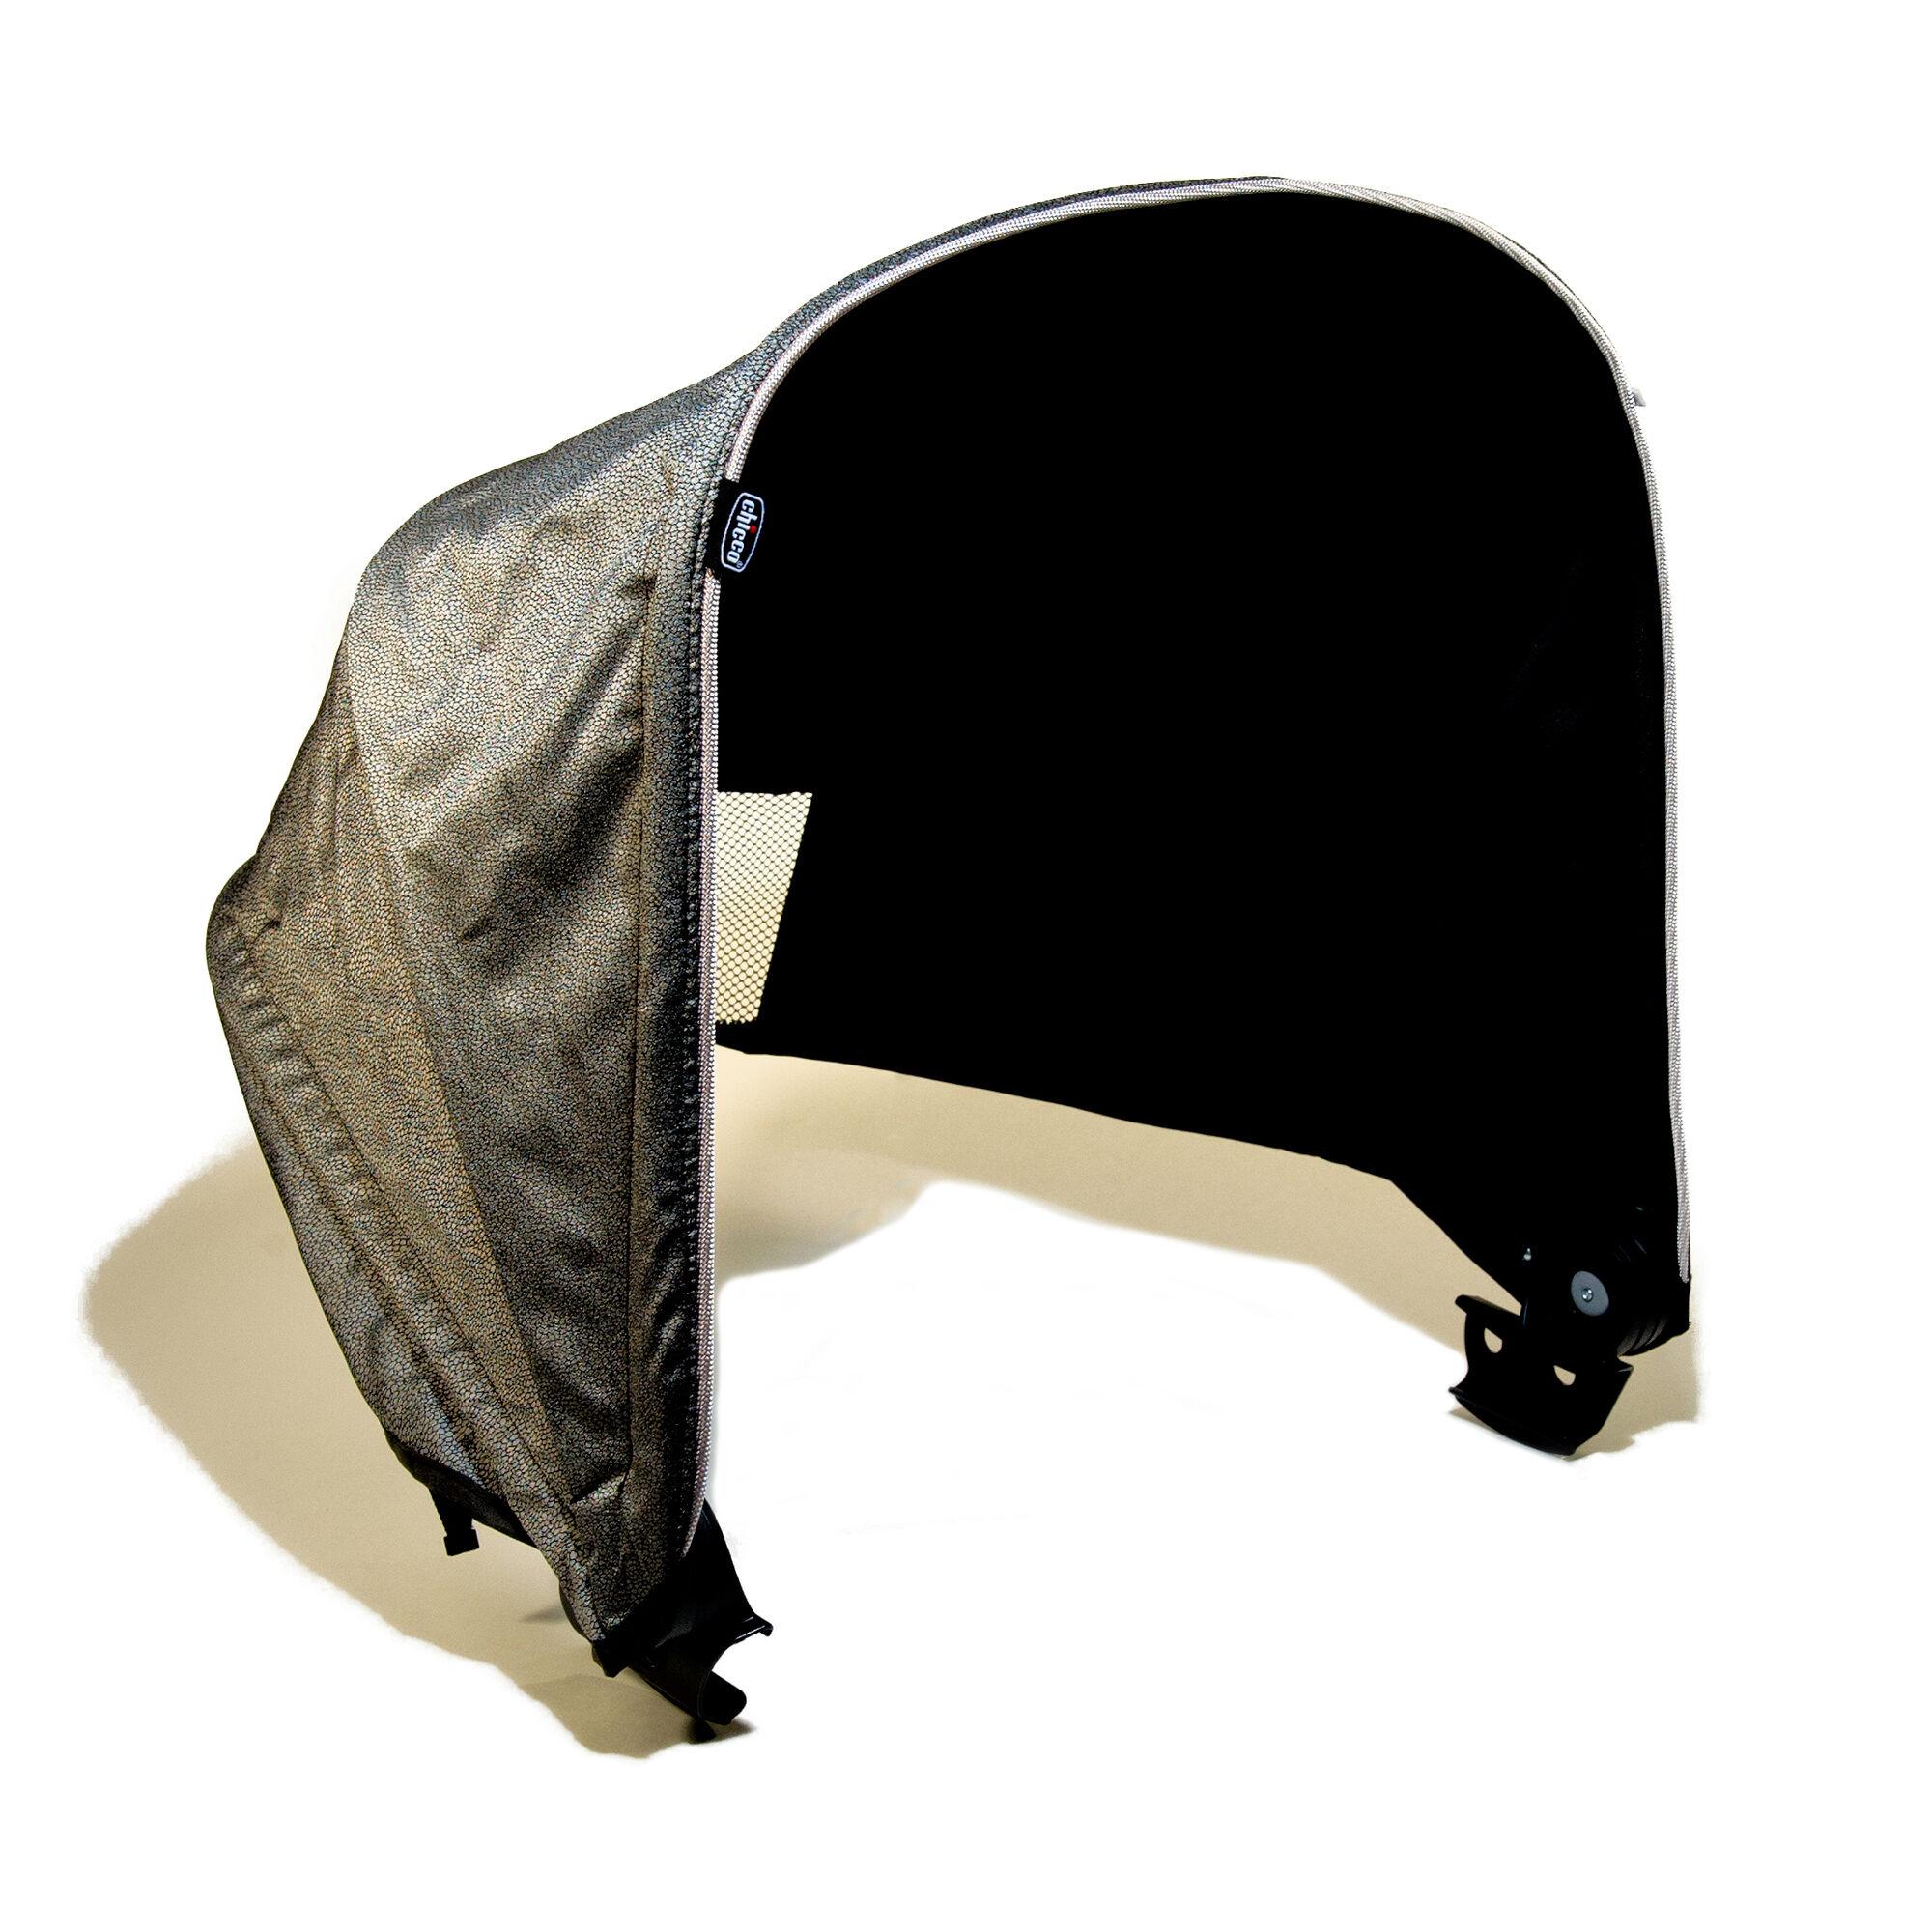 chico bravo stroller canopy avena. Black Bedroom Furniture Sets. Home Design Ideas